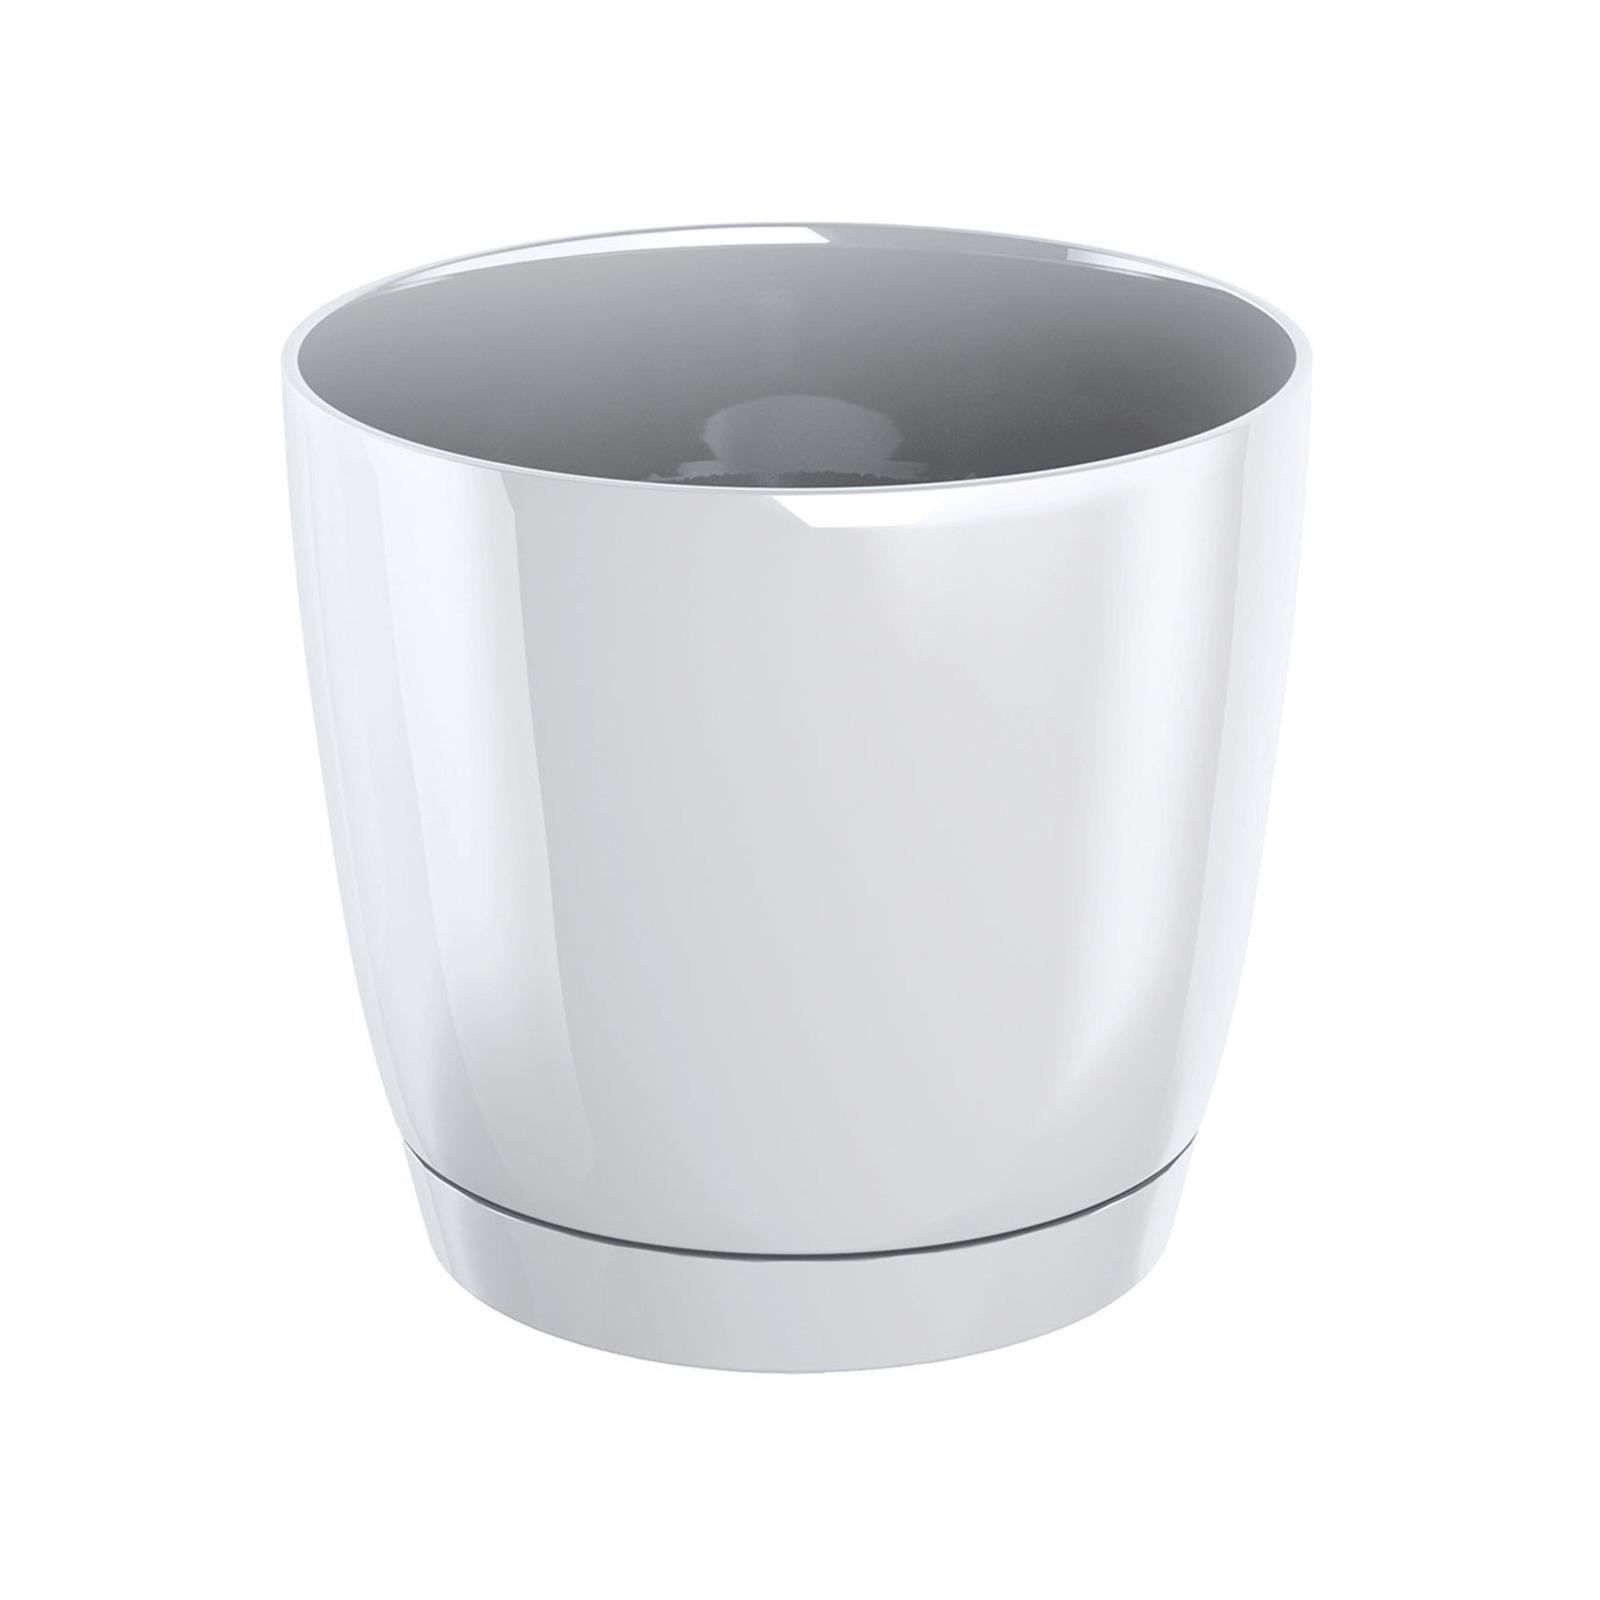 Prosperplast Coubi Round Pot - White (155mm X 142mm)